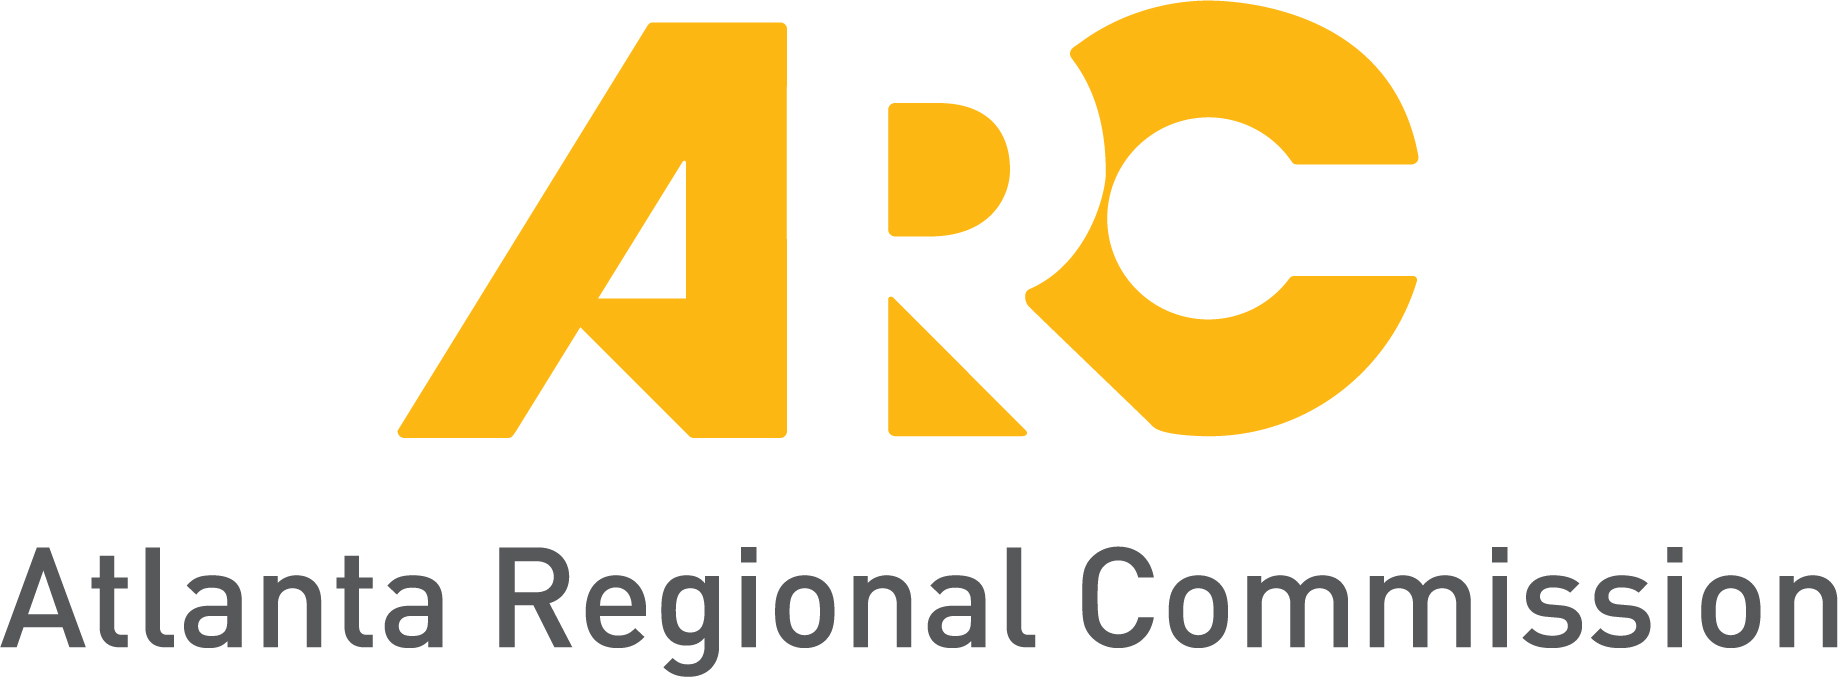 ARC_logo_PMS7549_PMS425.jpg